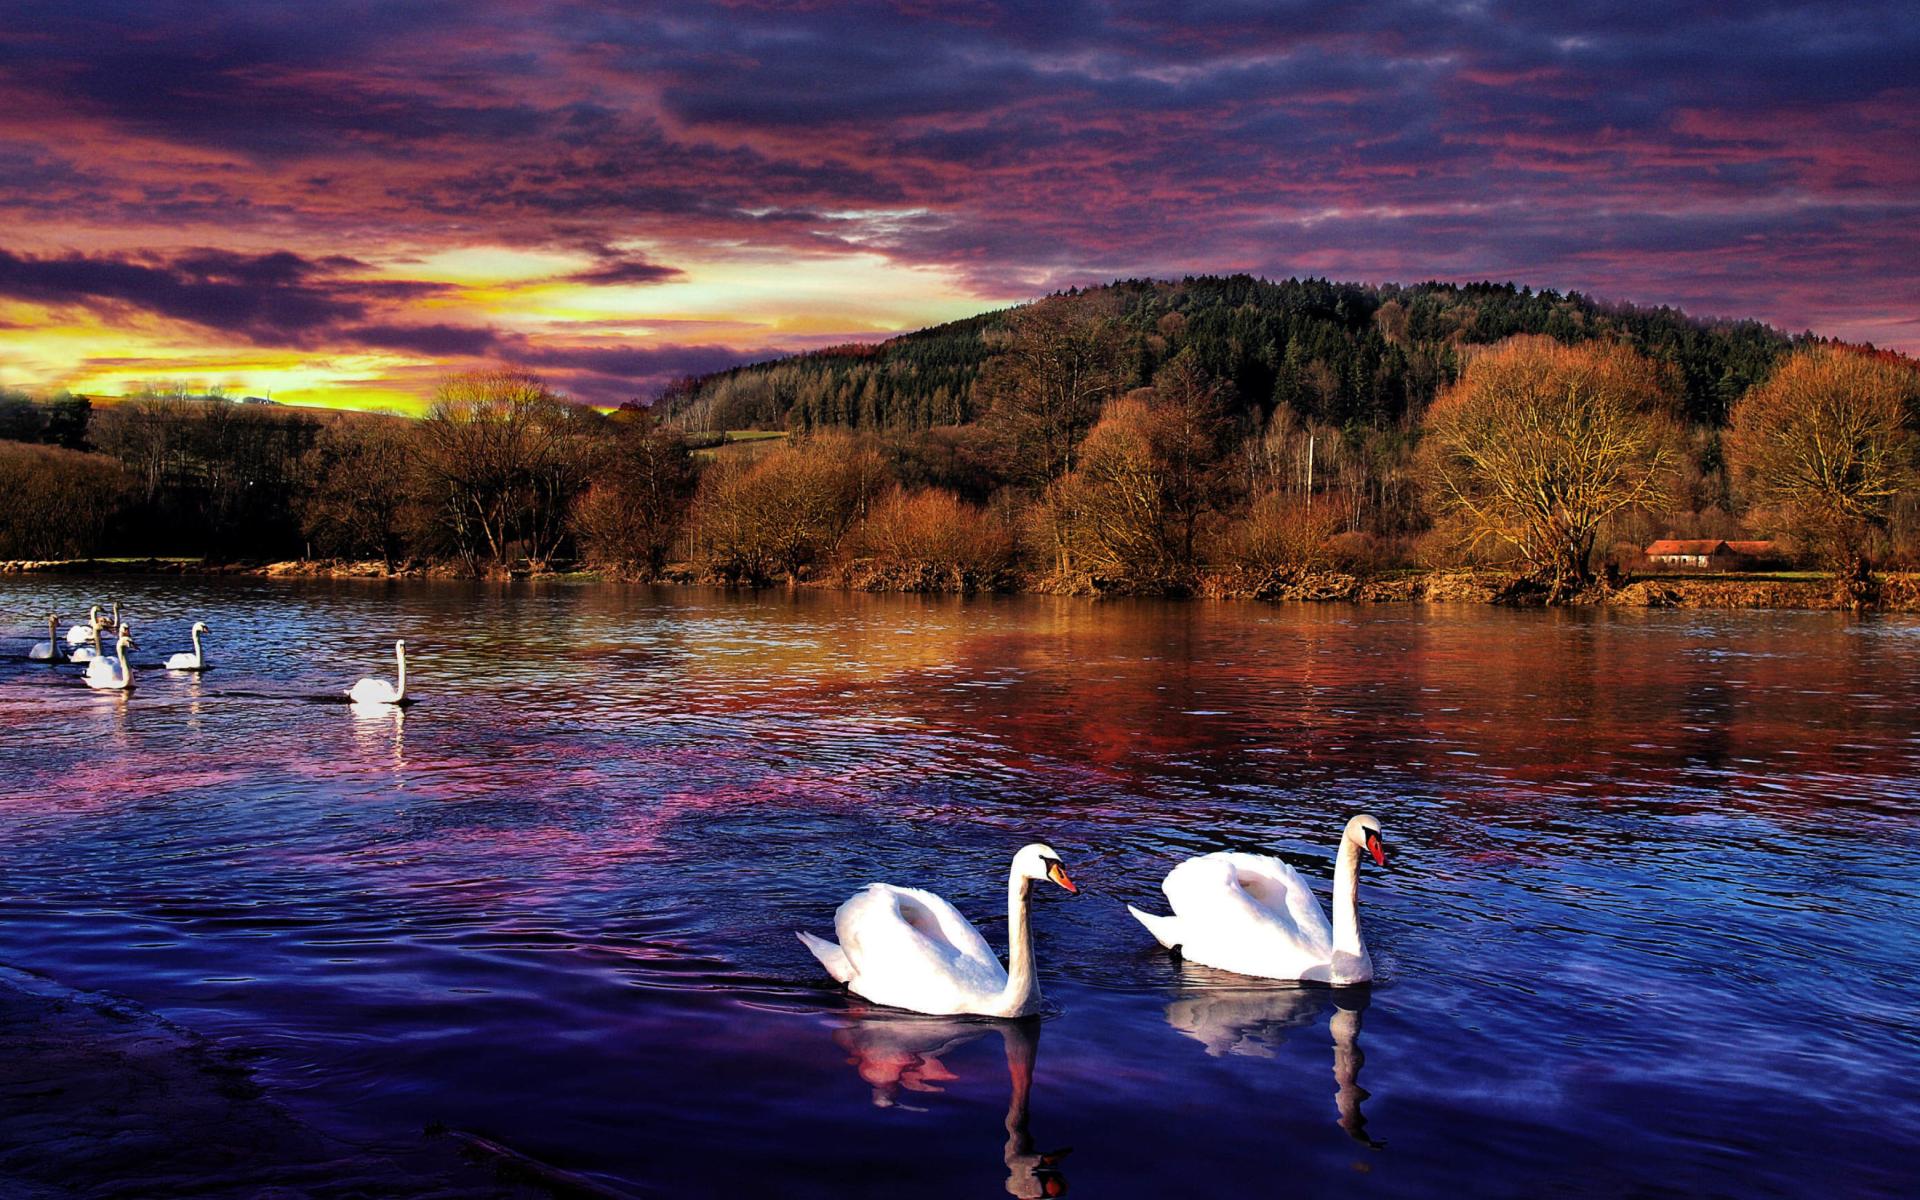 Swan lake wallpaper for widescreen desktop pc 1920x1080 - Swan wallpapers for desktop ...